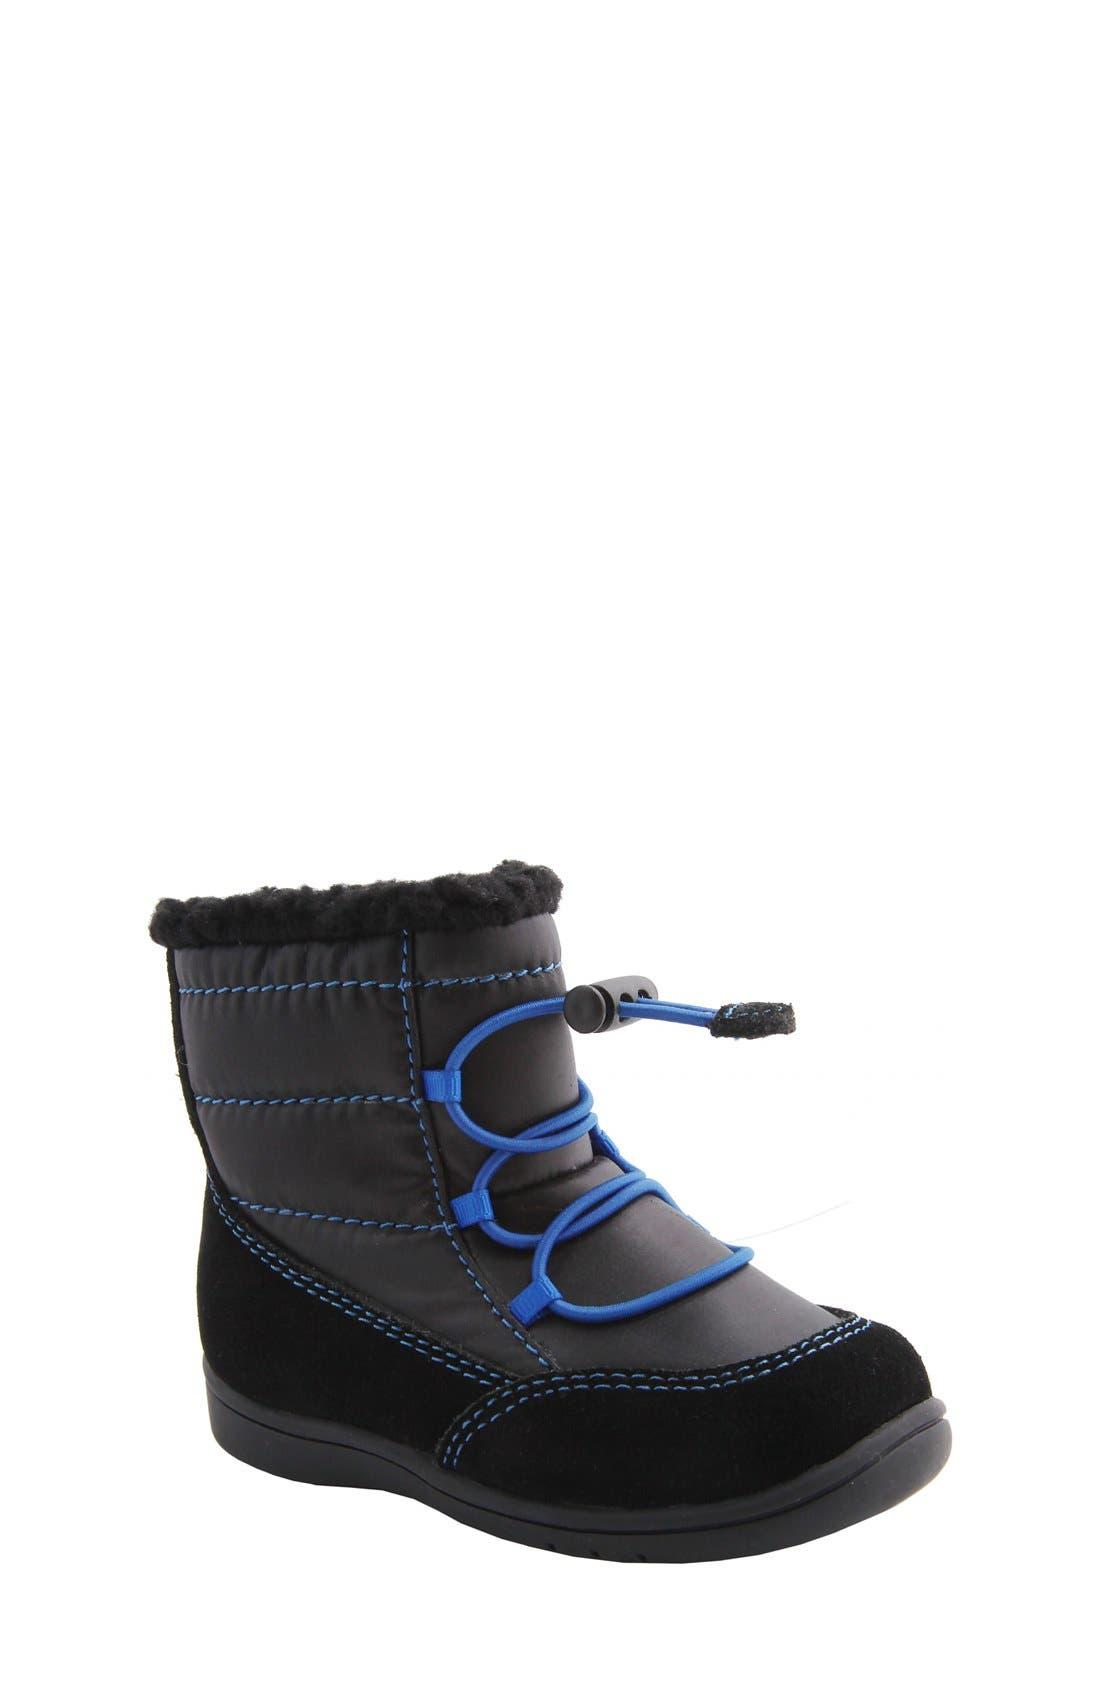 Alternate Image 1 Selected - Nina 'Yolie' Lace-Up Boot (Baby & Walker)